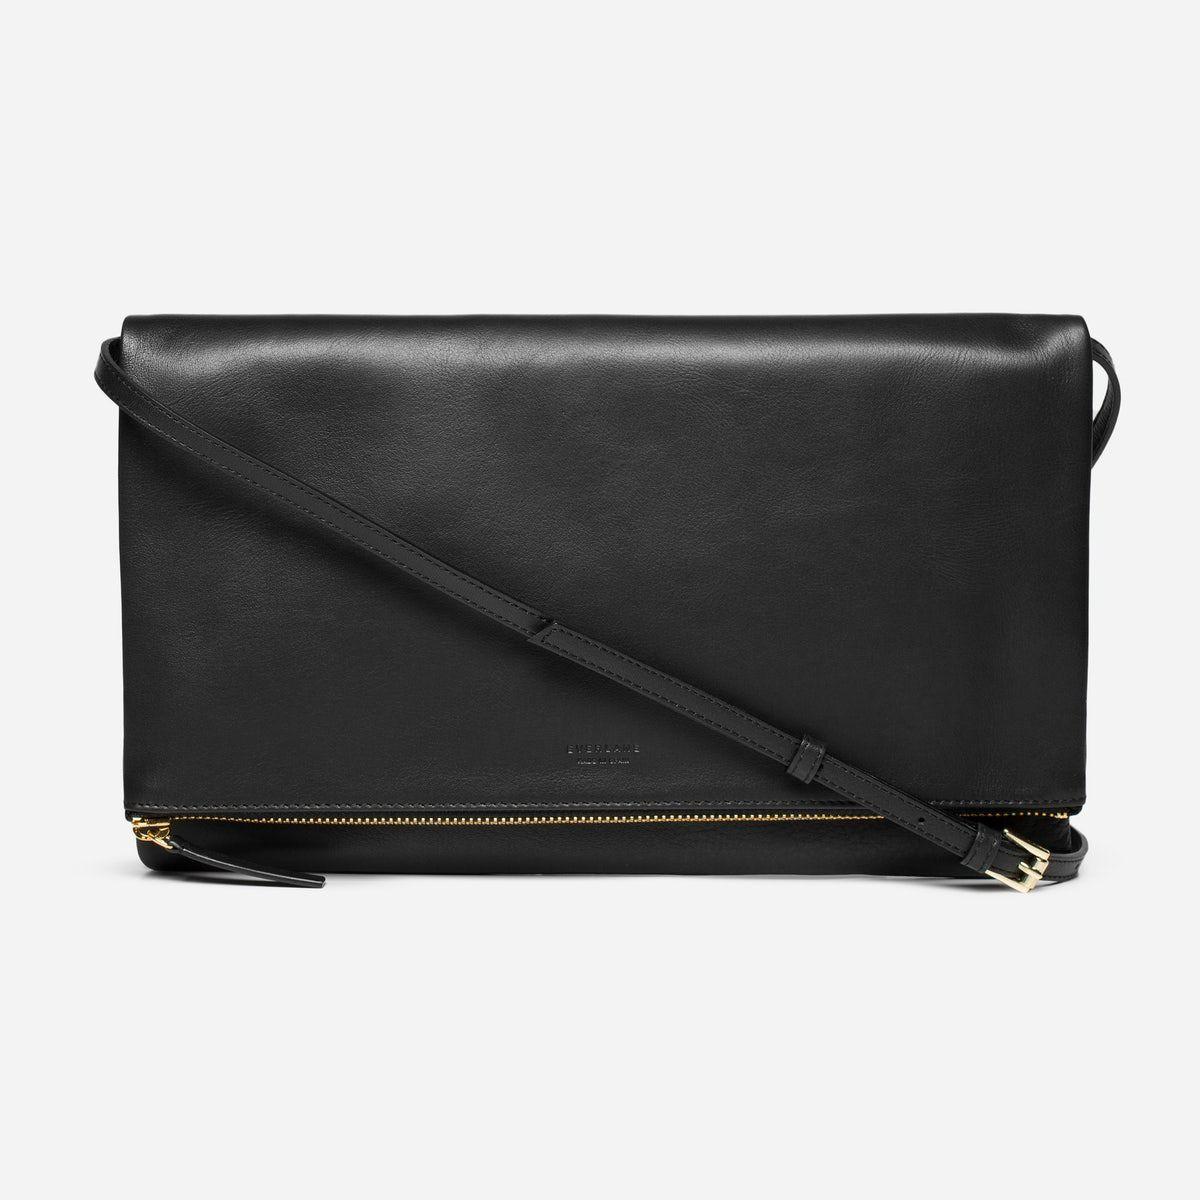 A black foldover bag